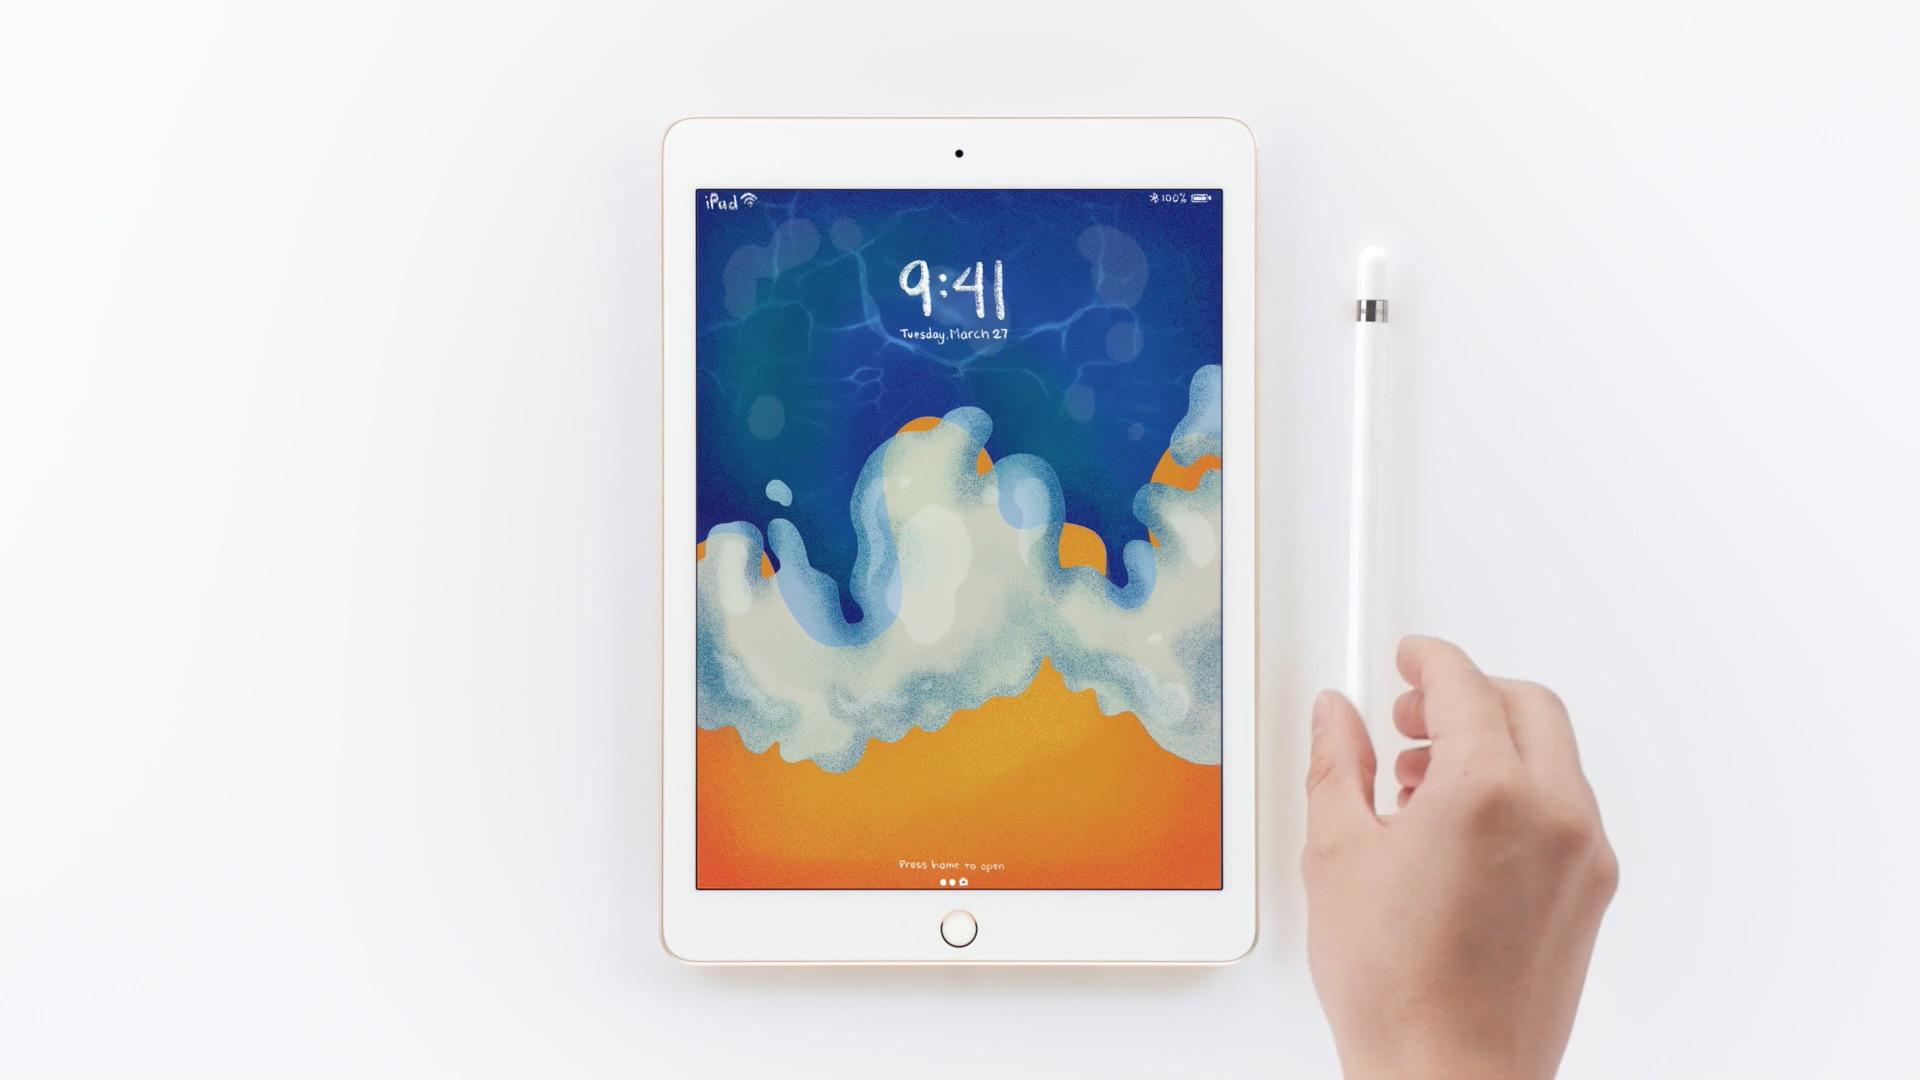 Apple Pencil対応、3.7万円の新型「iPad」登場。新機能・価格・発売日まとめ